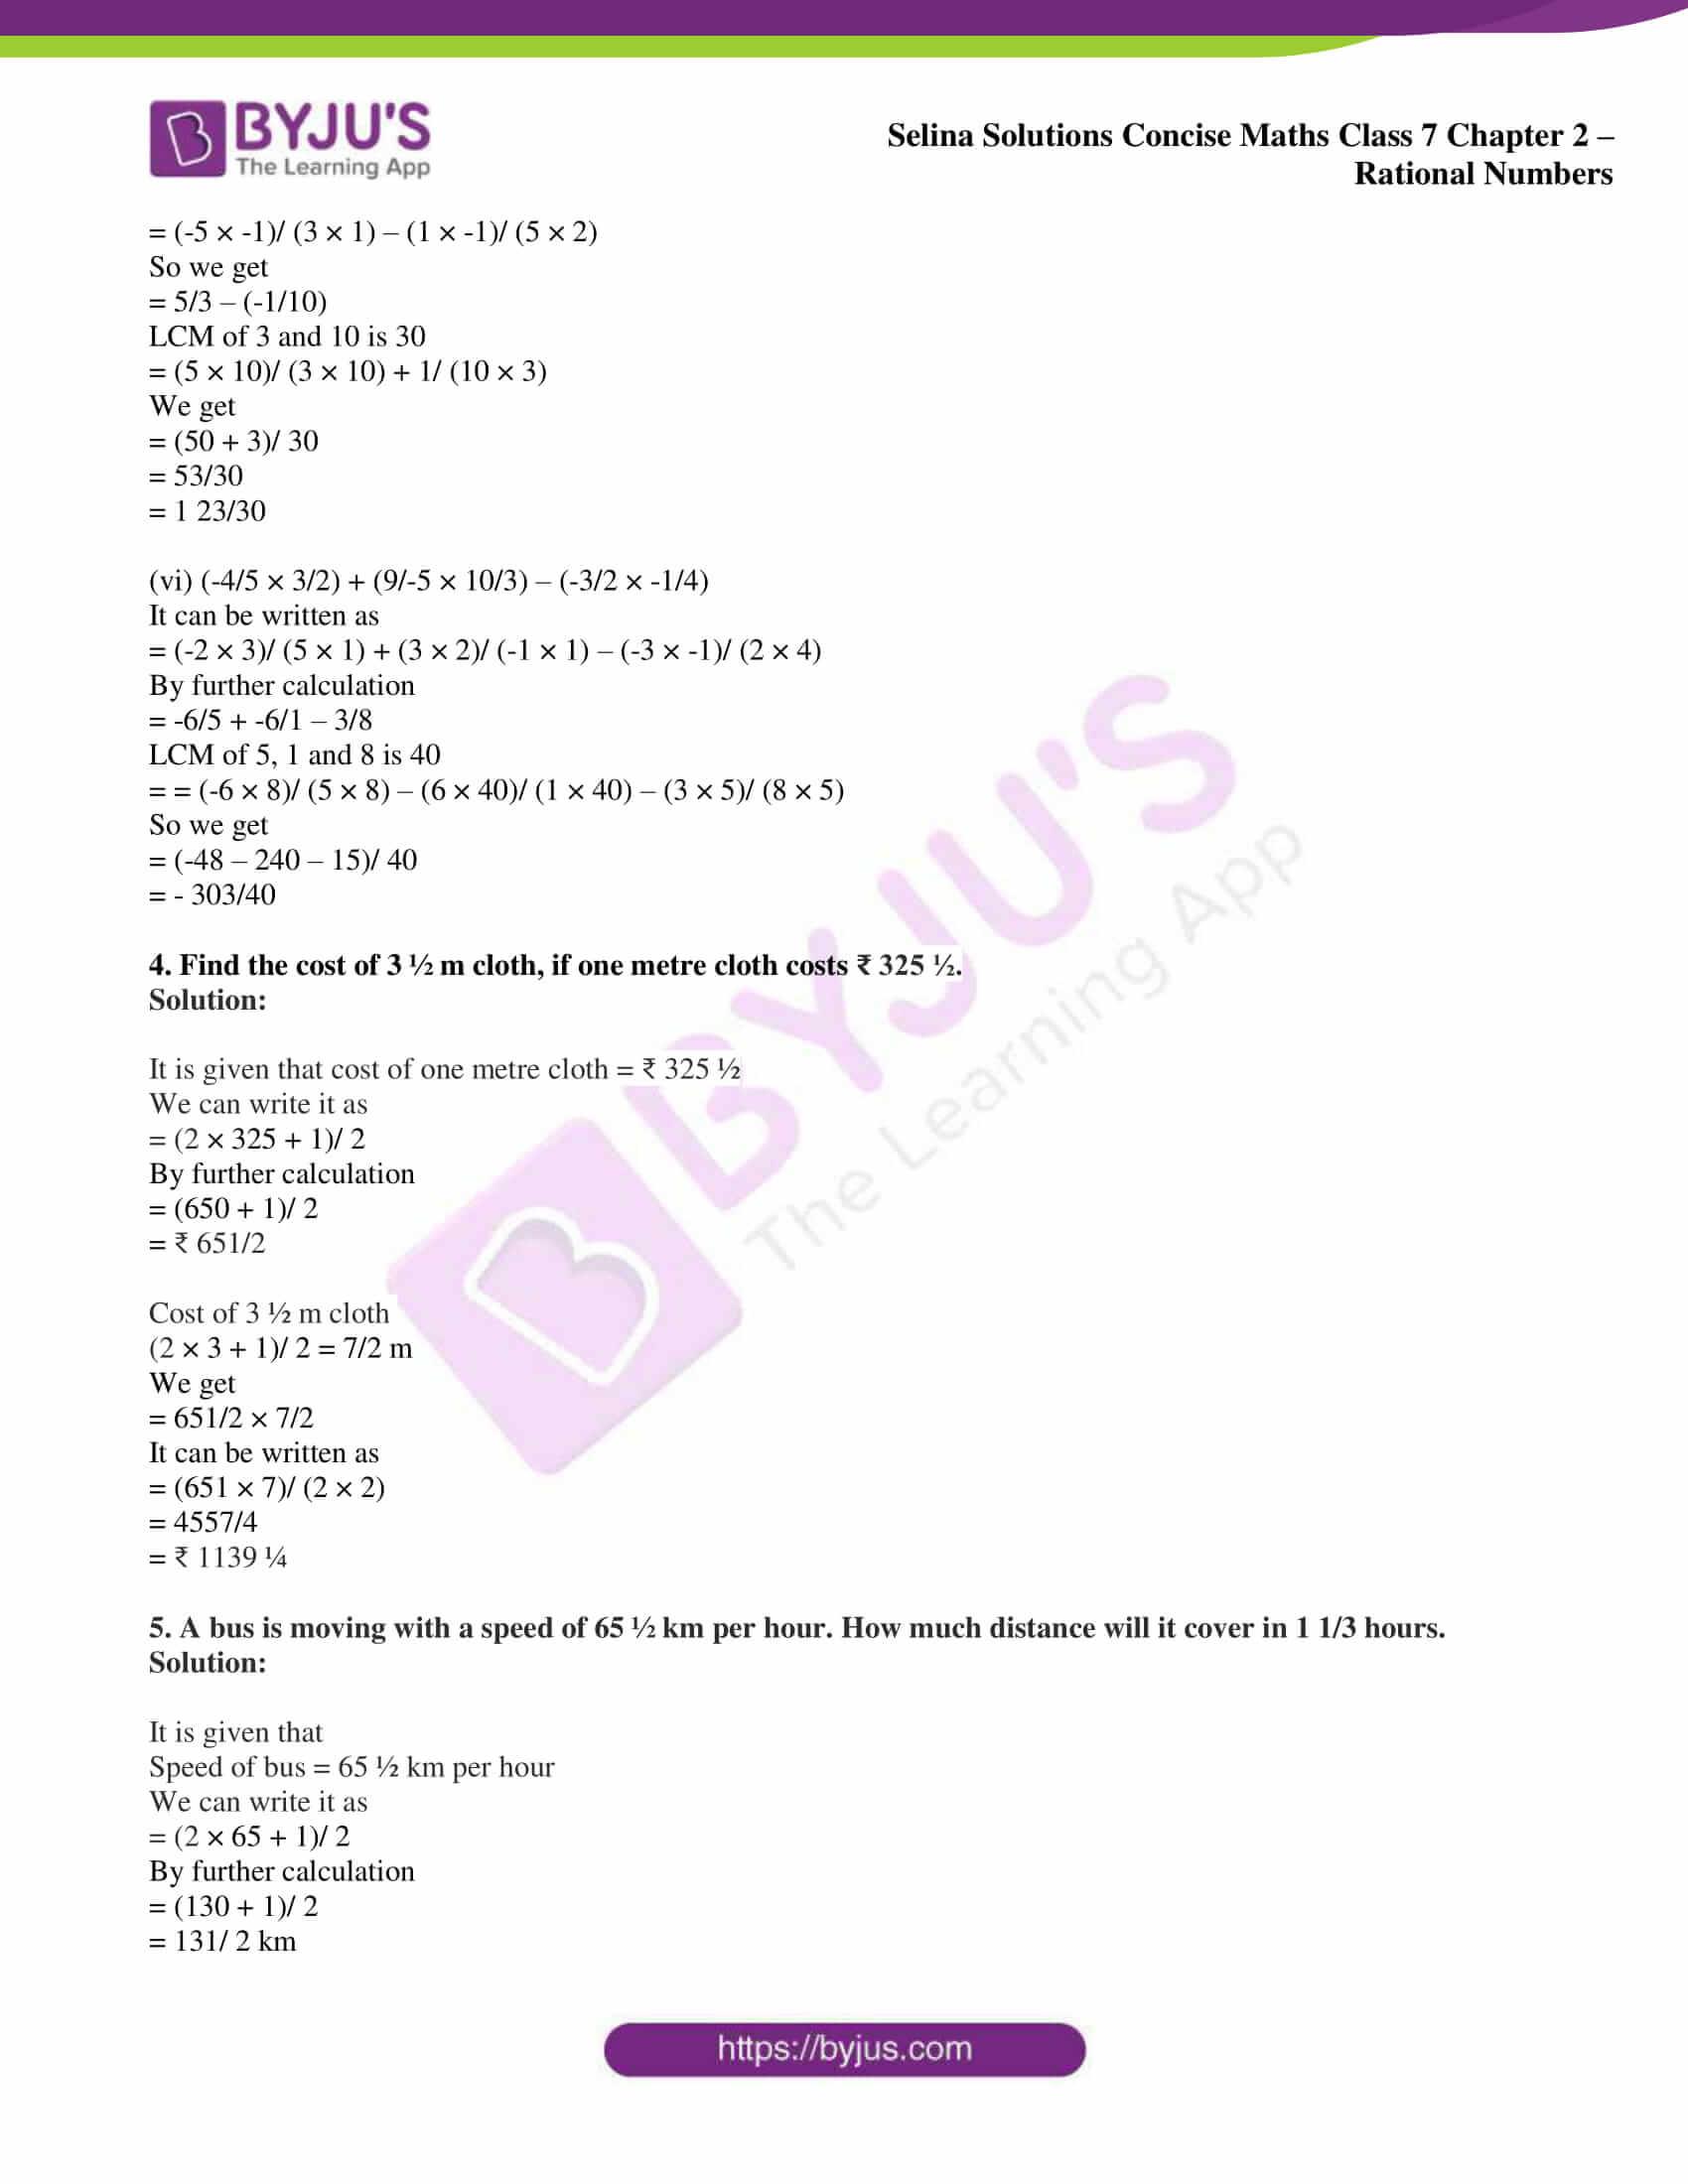 selina sol concise maths class 7 ch2 ex 2d 06